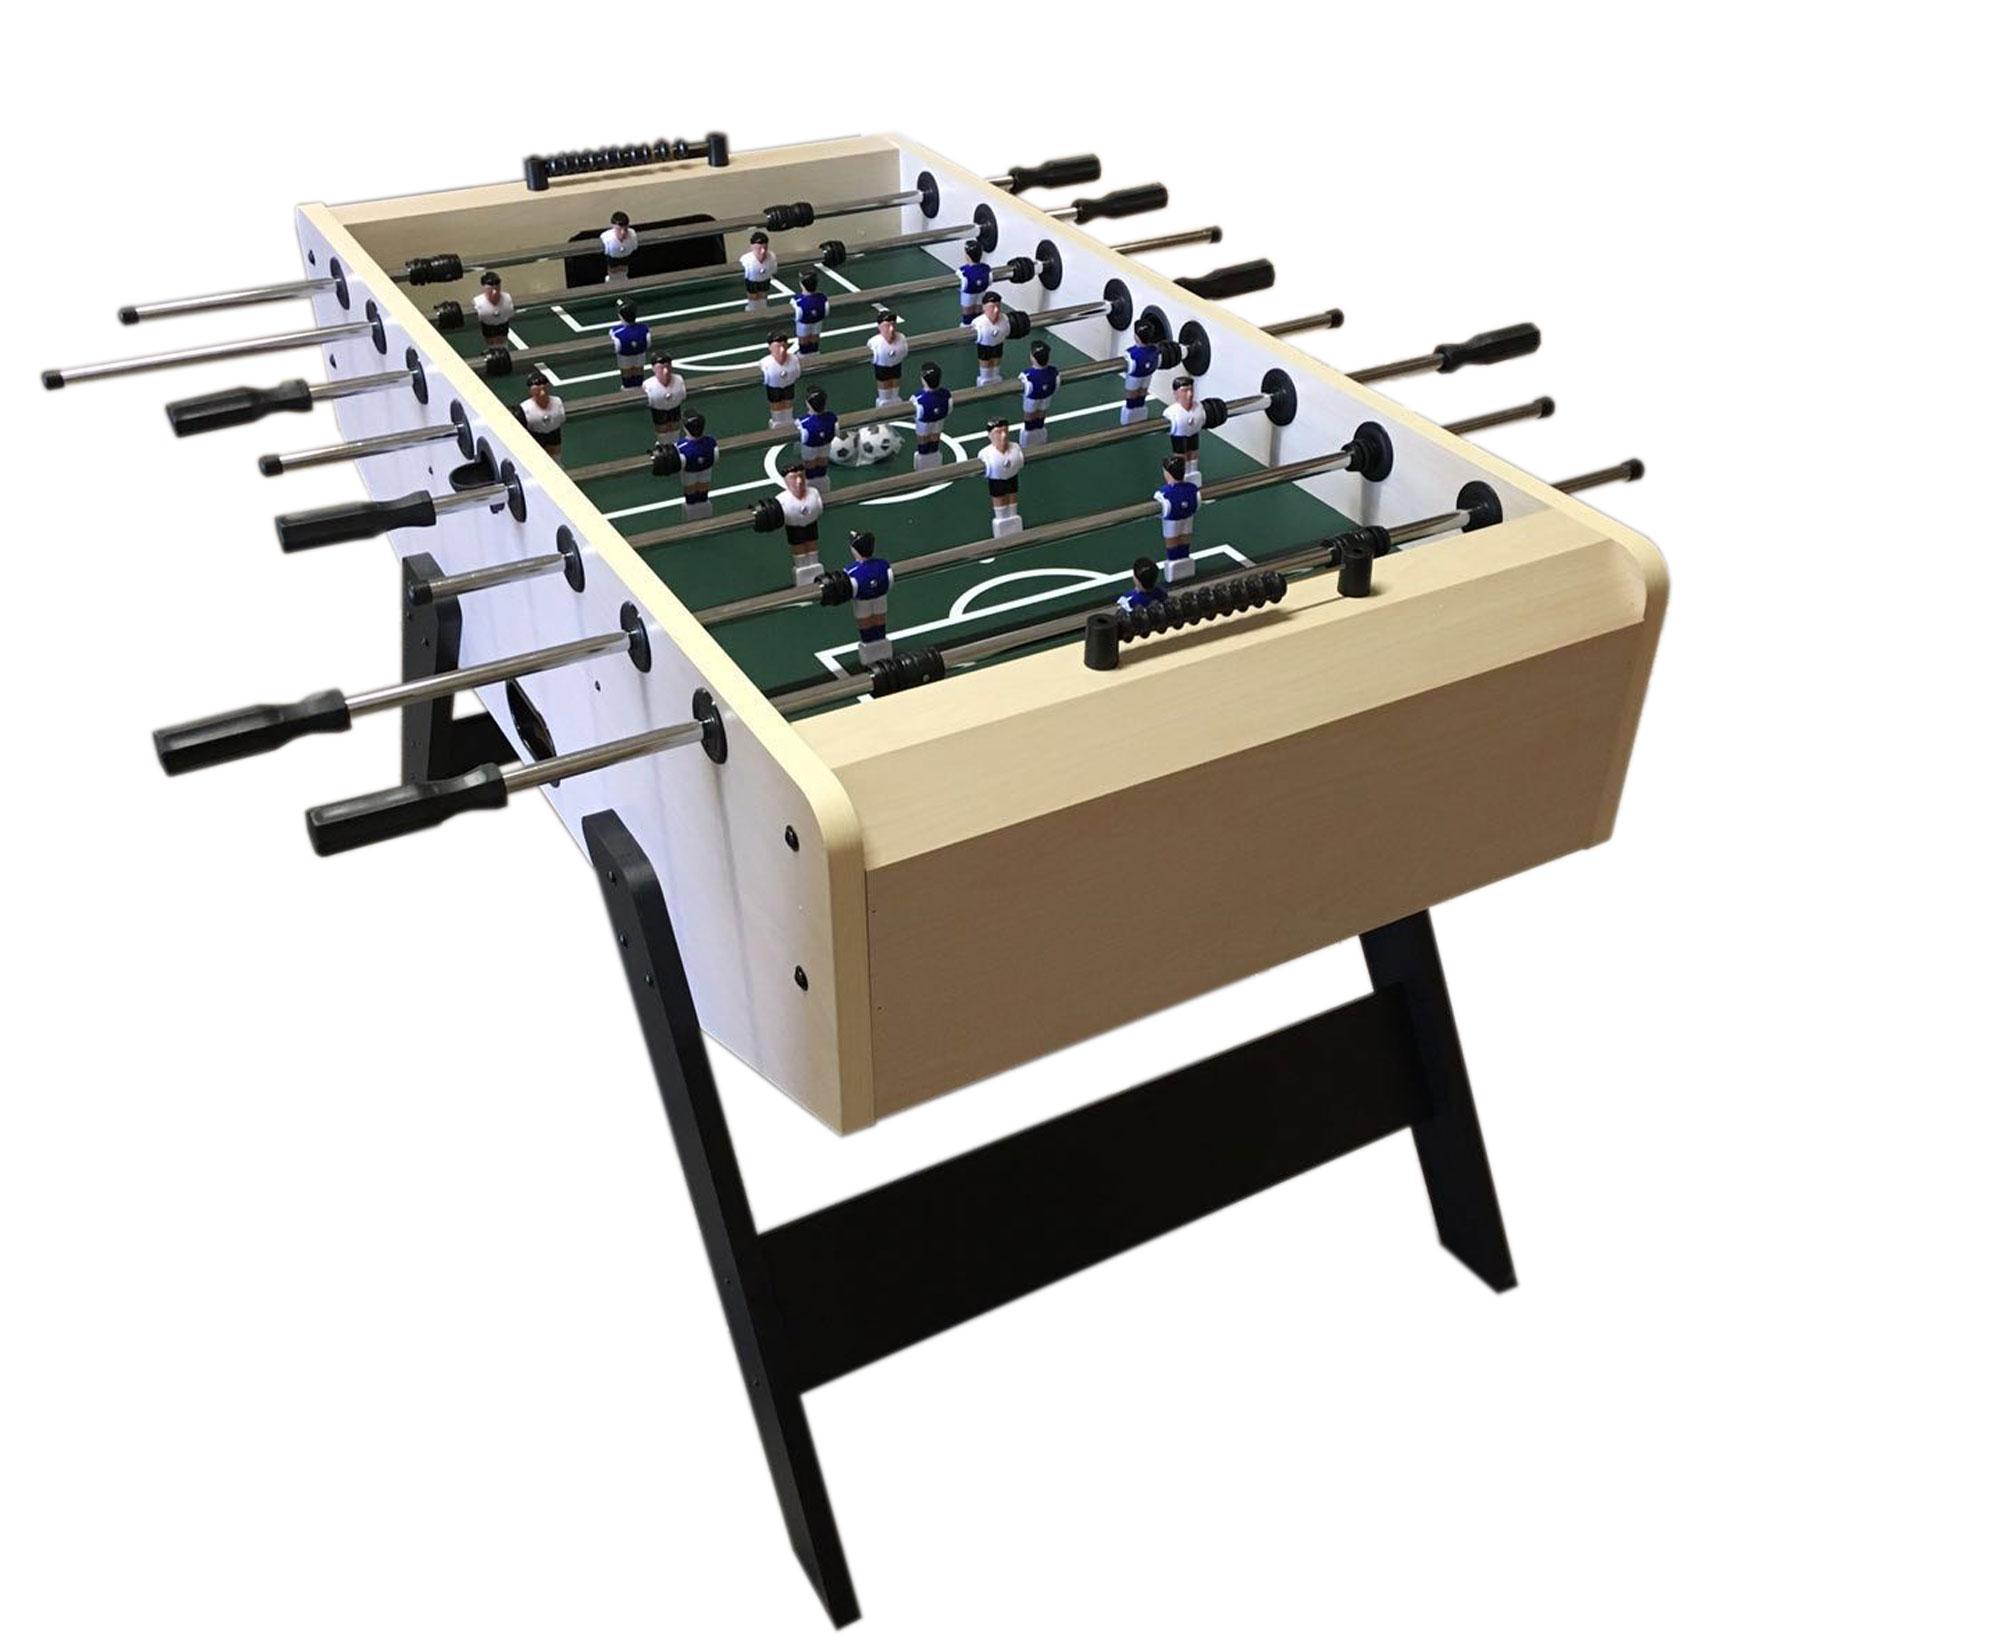 babyfoot bernabeu table de jeu football simbashopping france. Black Bedroom Furniture Sets. Home Design Ideas